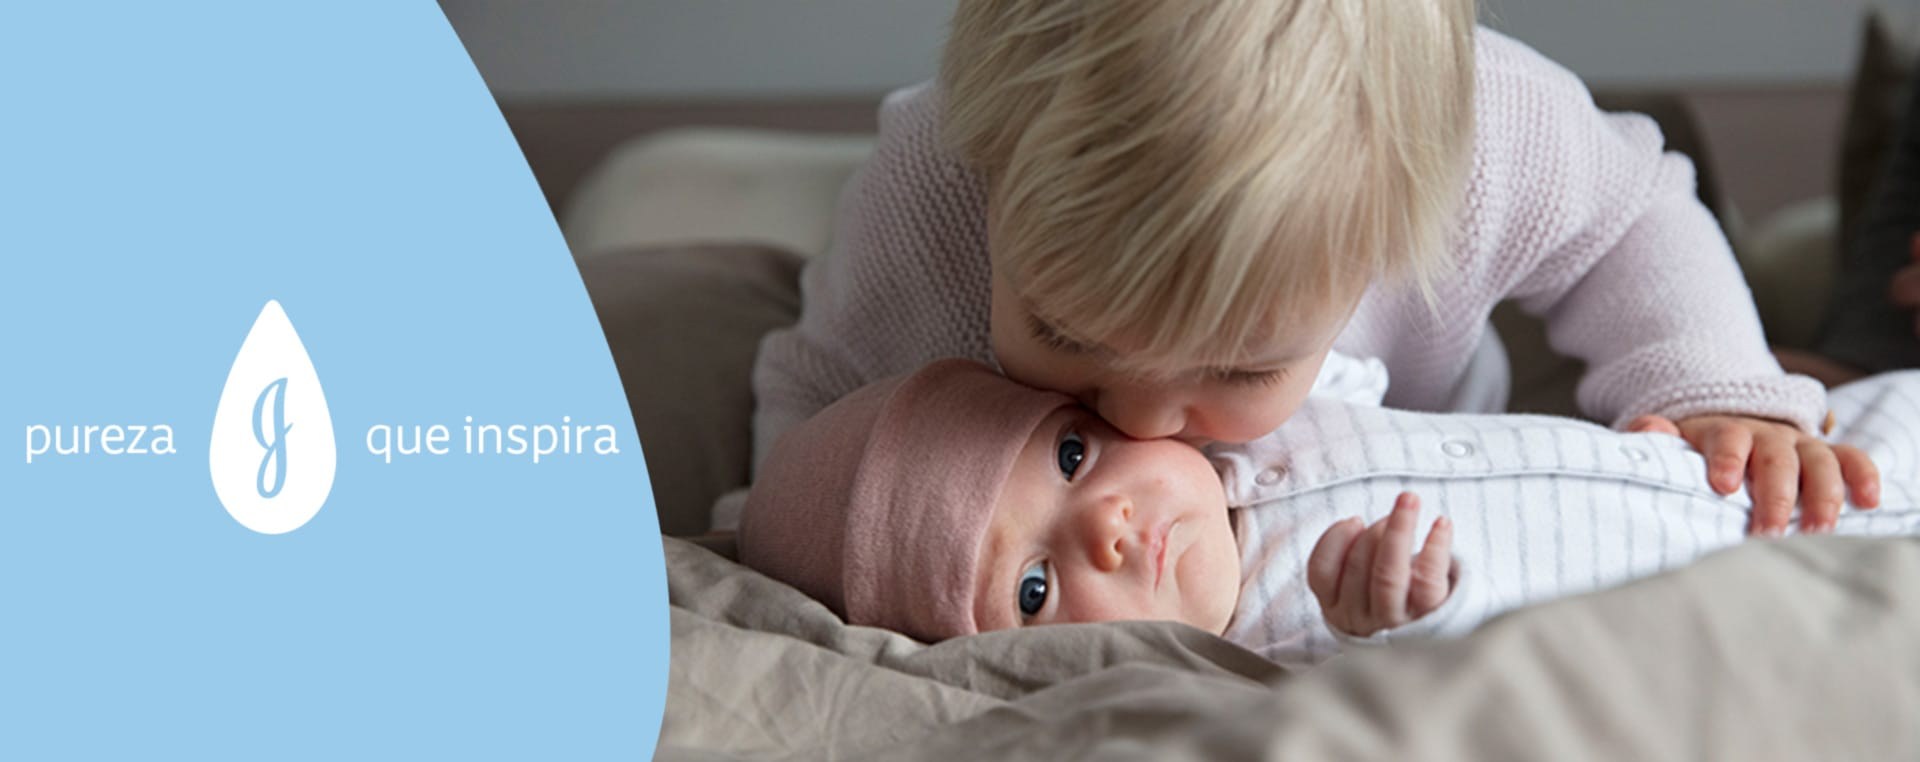 Criança beijando bebê